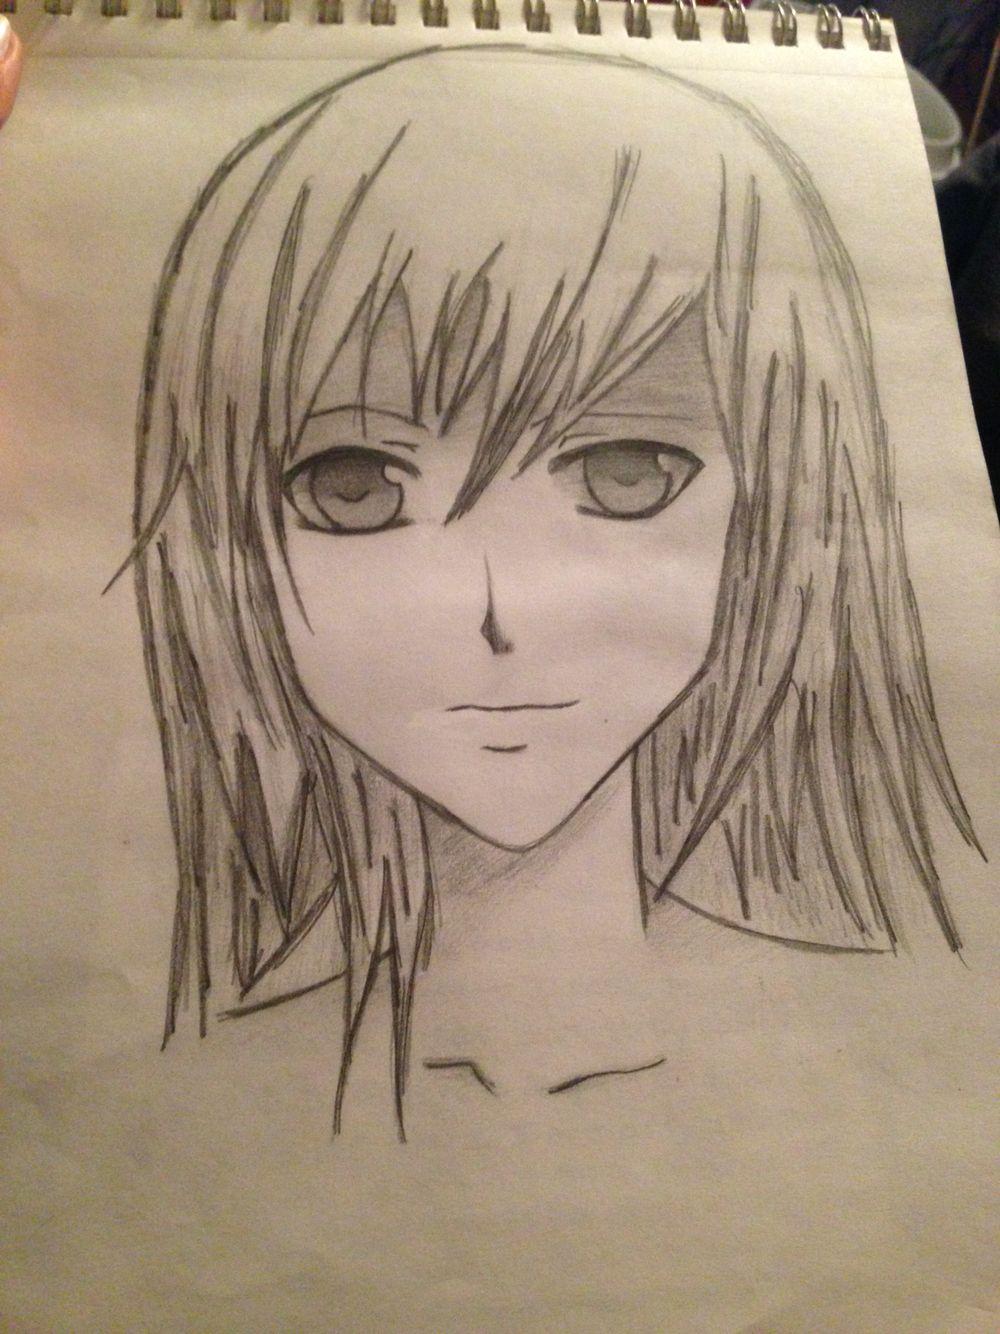 Anime self portrait tekenen